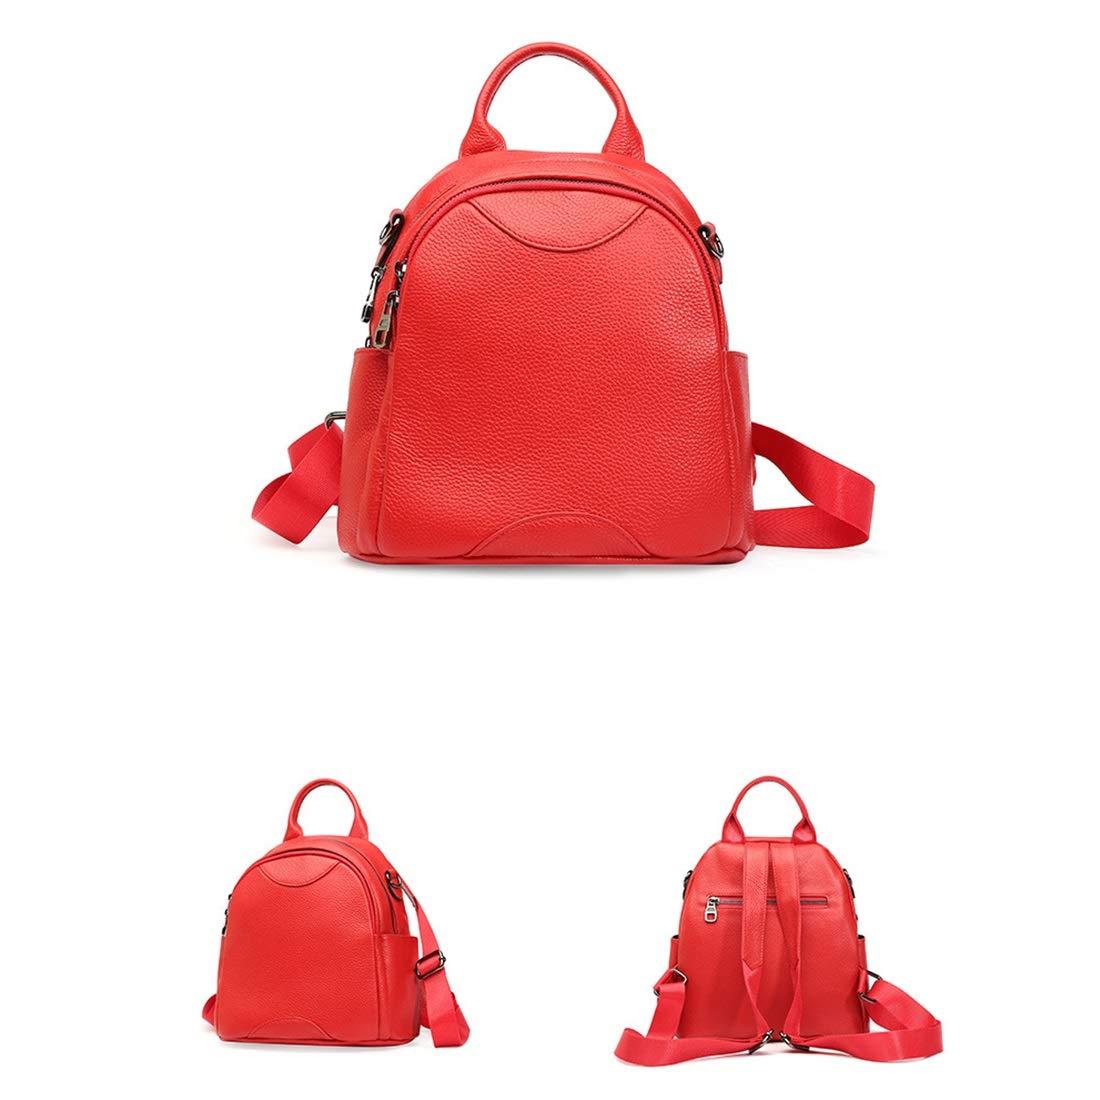 Ryggsäck kvinnor ryggsäck handväska vattentät oxfordtyg dam resväska skolväskor stöldsäker ryggsäck axelväskor laptopryggsäck (färg: Lila) röd